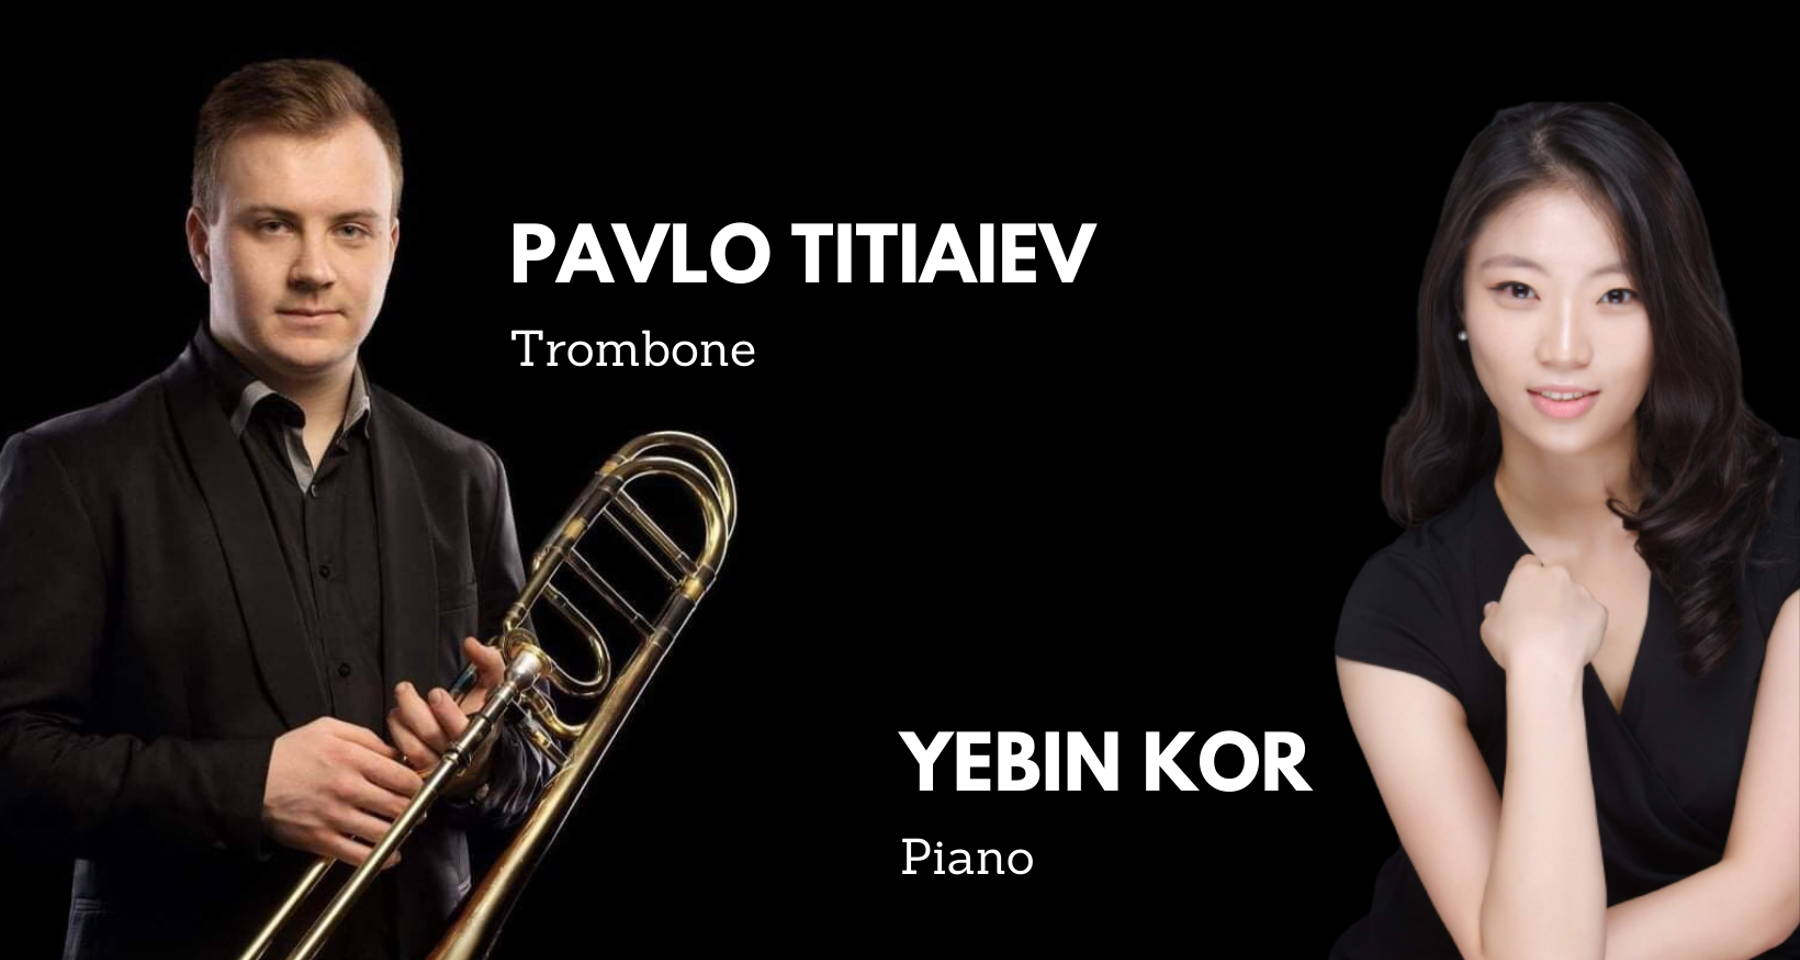 Pavlo & YeBin perform Telemann, Schubert, Hindemith, Pryor and others